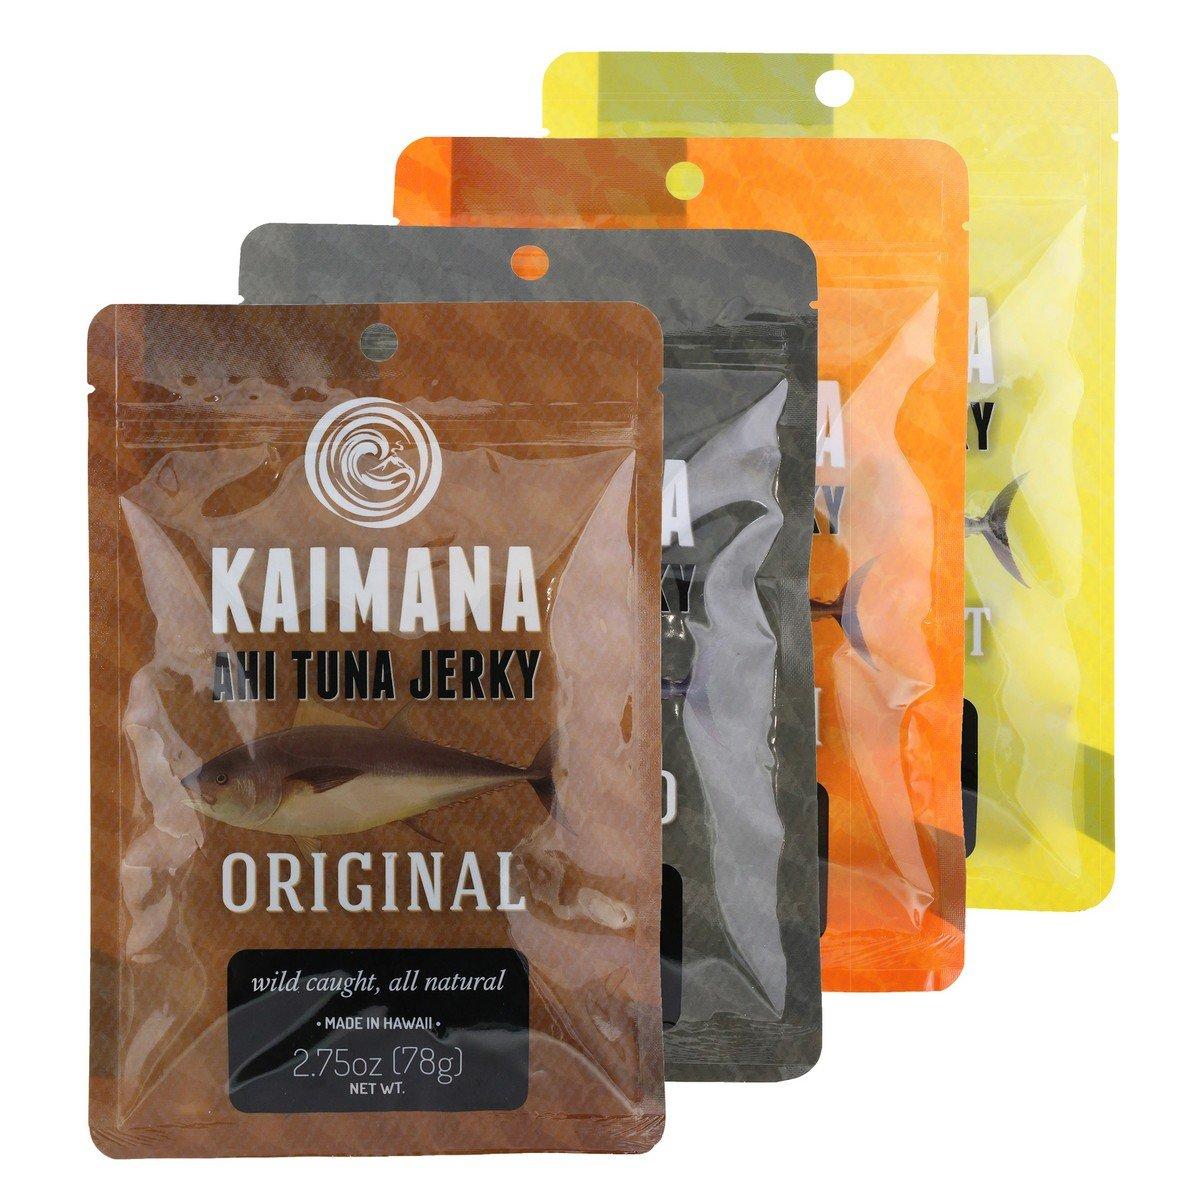 Kaimana Jerky - Ahi Tuna Jerky Variety Bundle 4 pk - Original, Teriyaki, Peppered and Lemon Salt Tuna Jerky flavors. All Natural & Wild Caught Tuna Jerky. Made in USA